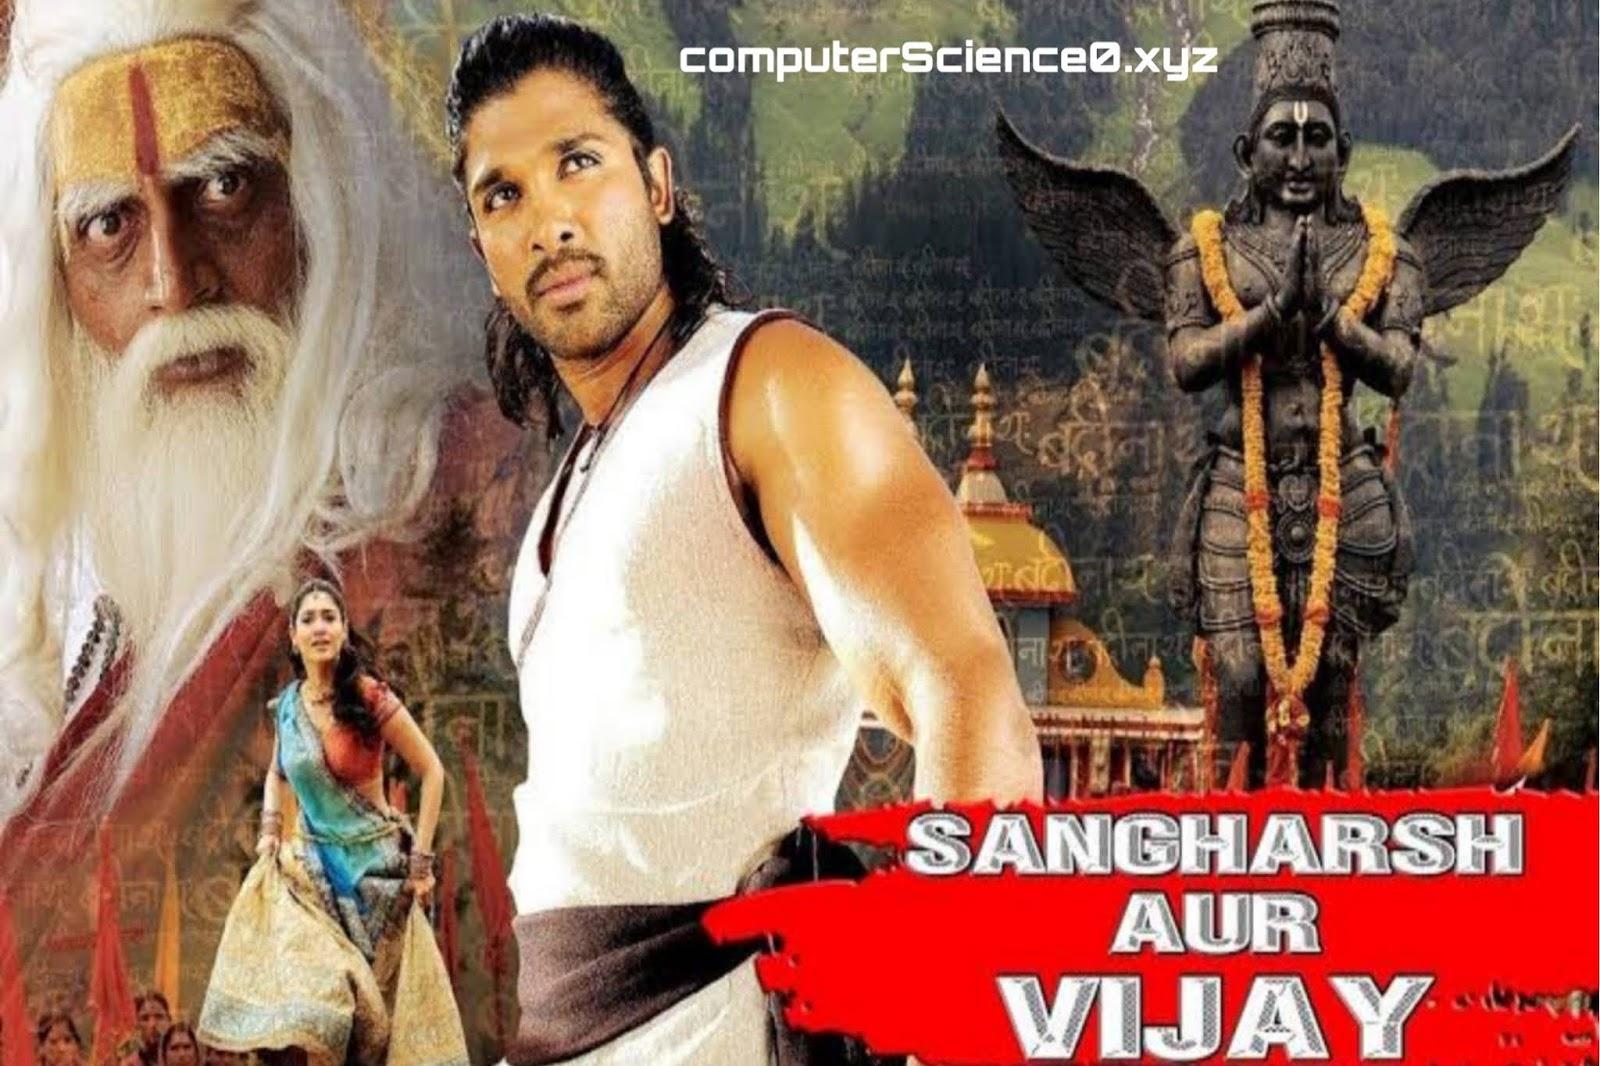 Badrinath,Sangharsh Aur Vijay Allu Arjun's Top 19 movies of all time